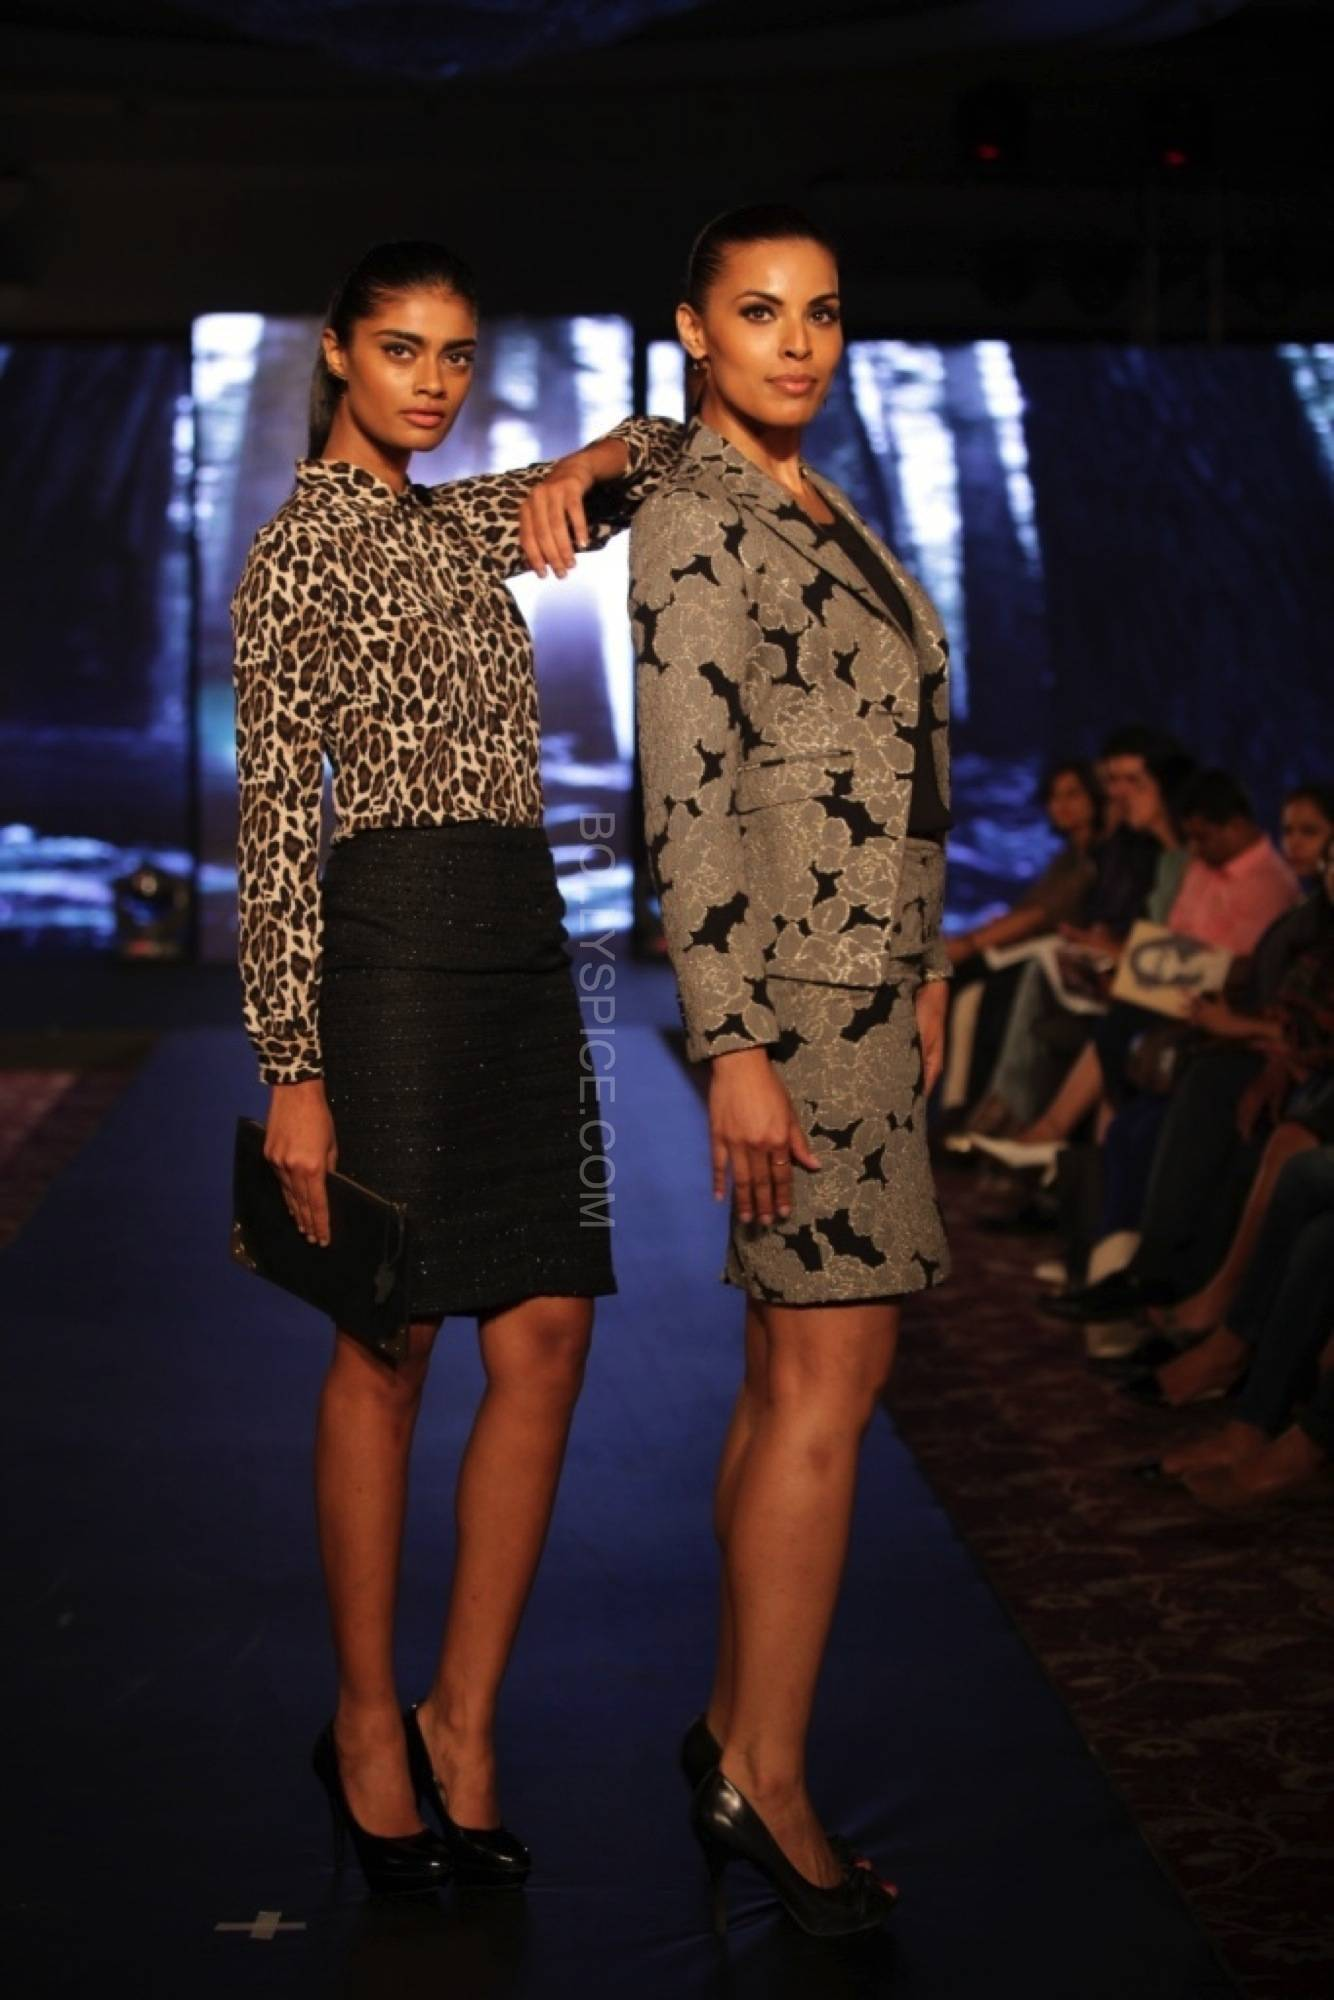 deepikapadukonefanfadhionshow6 Deepika Padukones Fans Fashion Show for Van Heusen